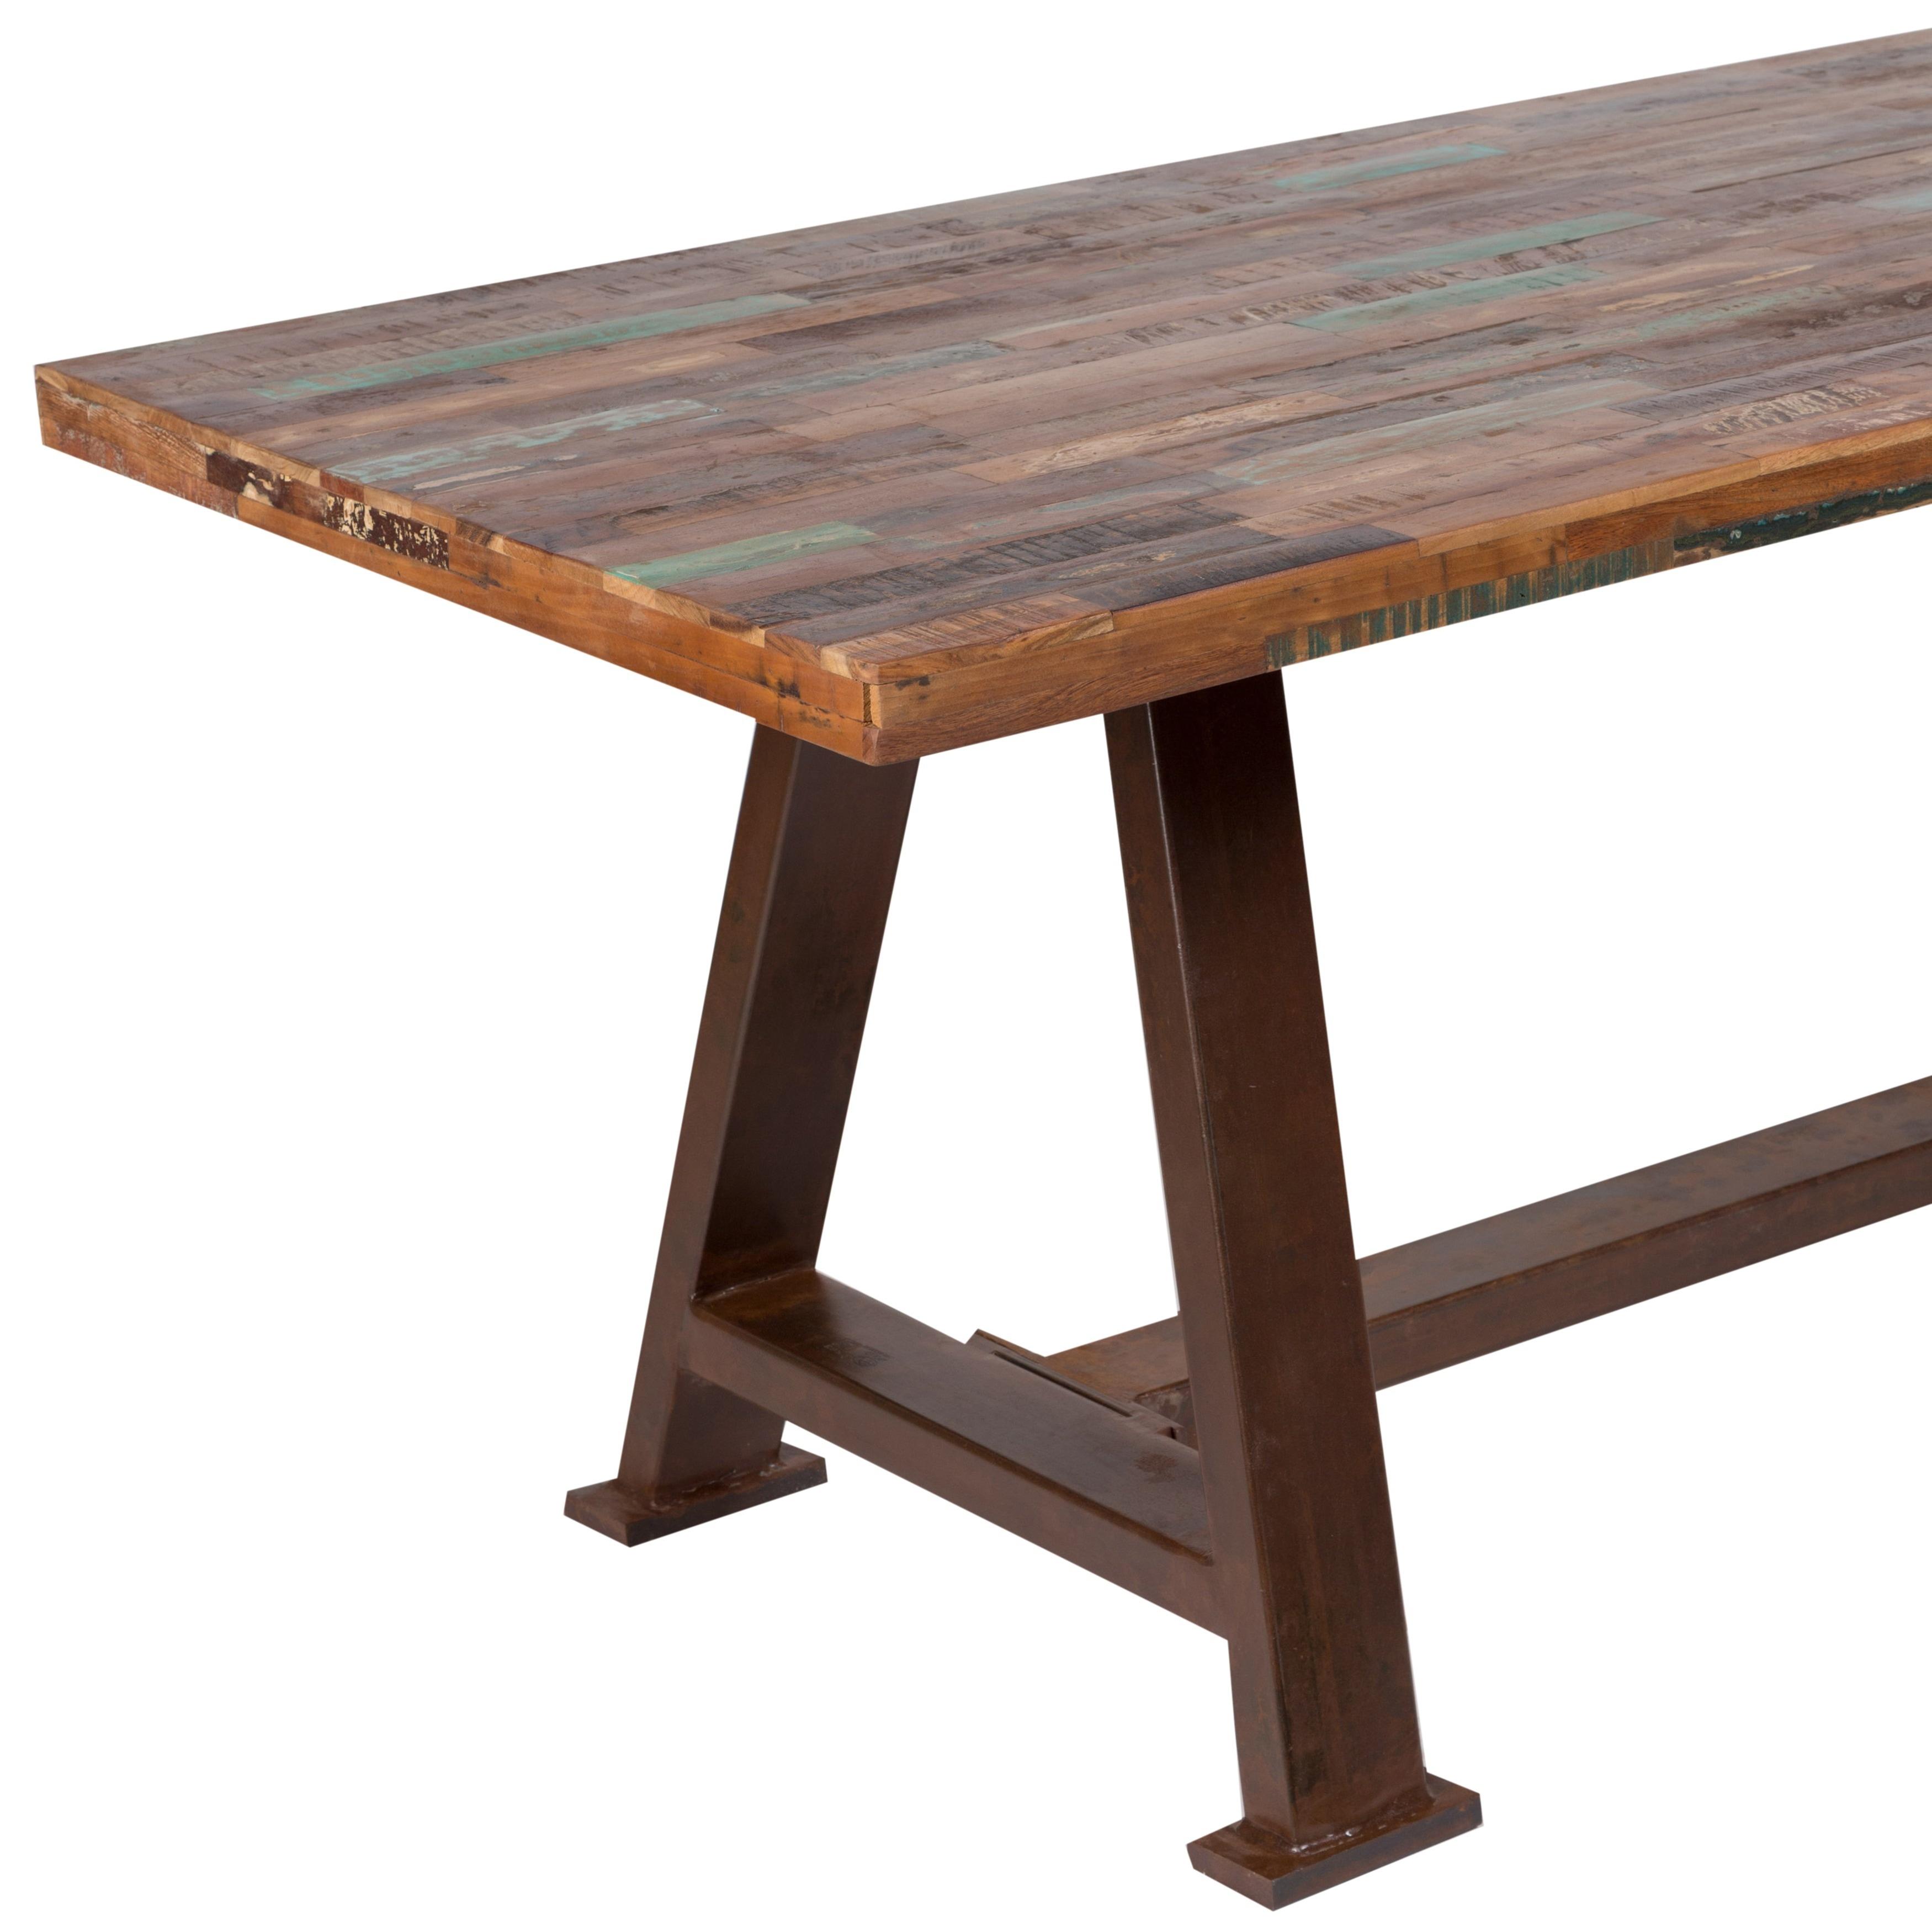 Handmade Wanderloot Brooklyn Reclaimed Salvage Wood Dining Table With Heavy Metal Industrial Base India